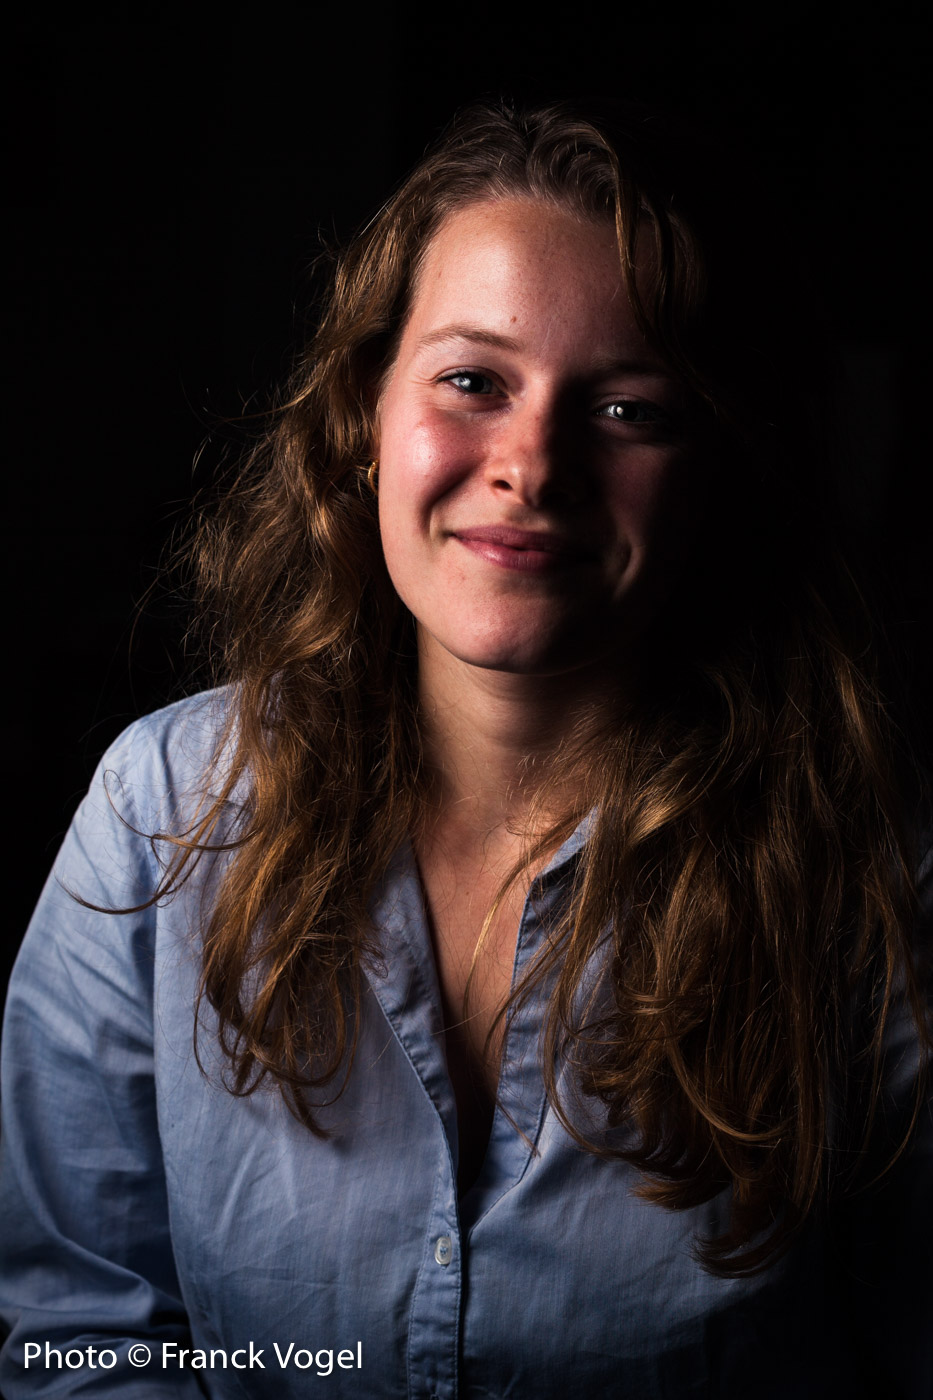 Charlotte Bour